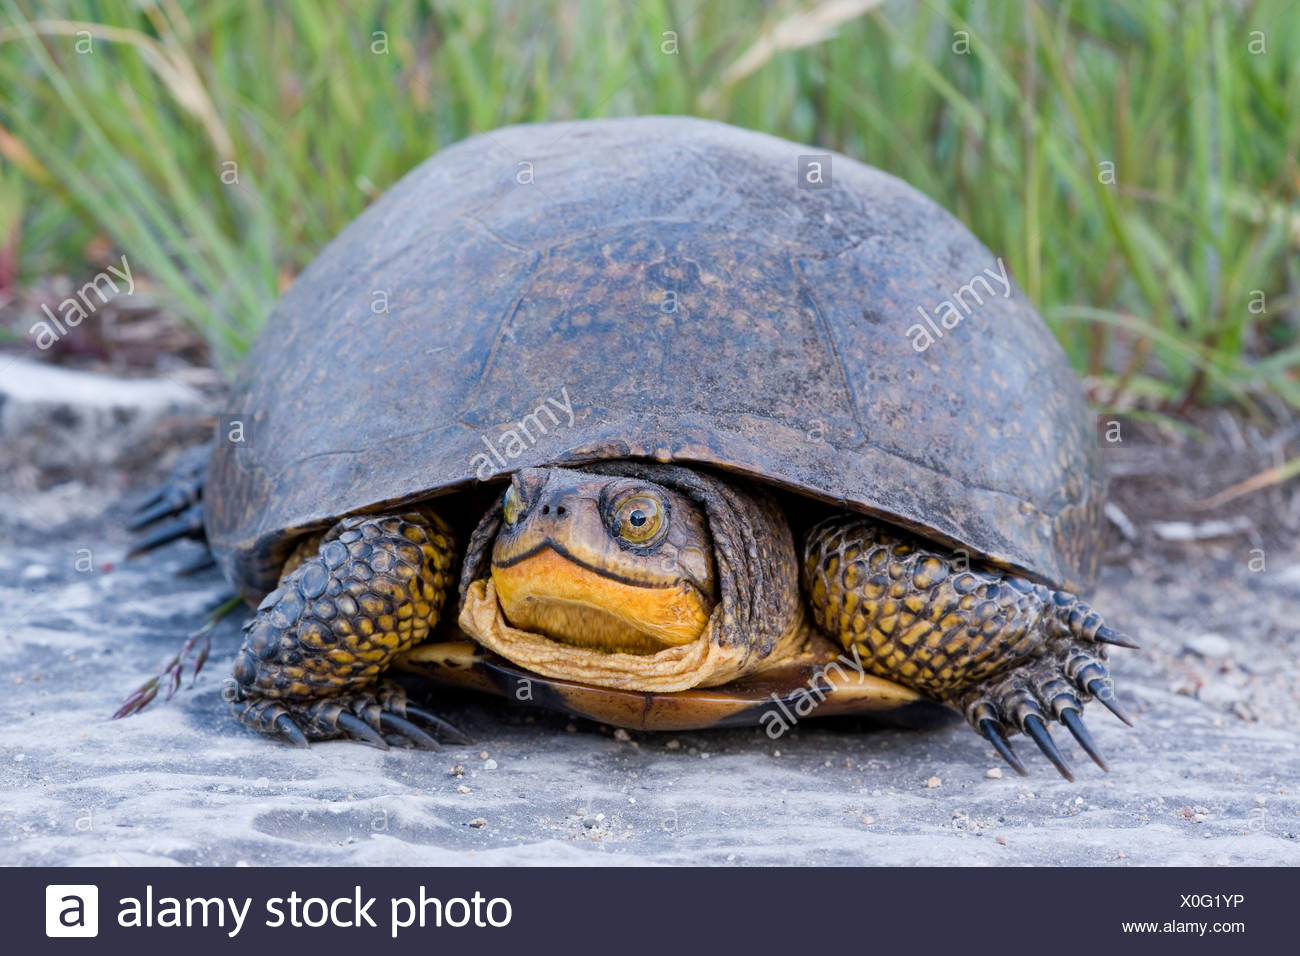 Blanding's Turtle (Emydoidea blandingii) (Endangered in Nova Scotia; Threatened in Great Lakes/St. Lawrence) Misery Bay Provinci - Stock Image